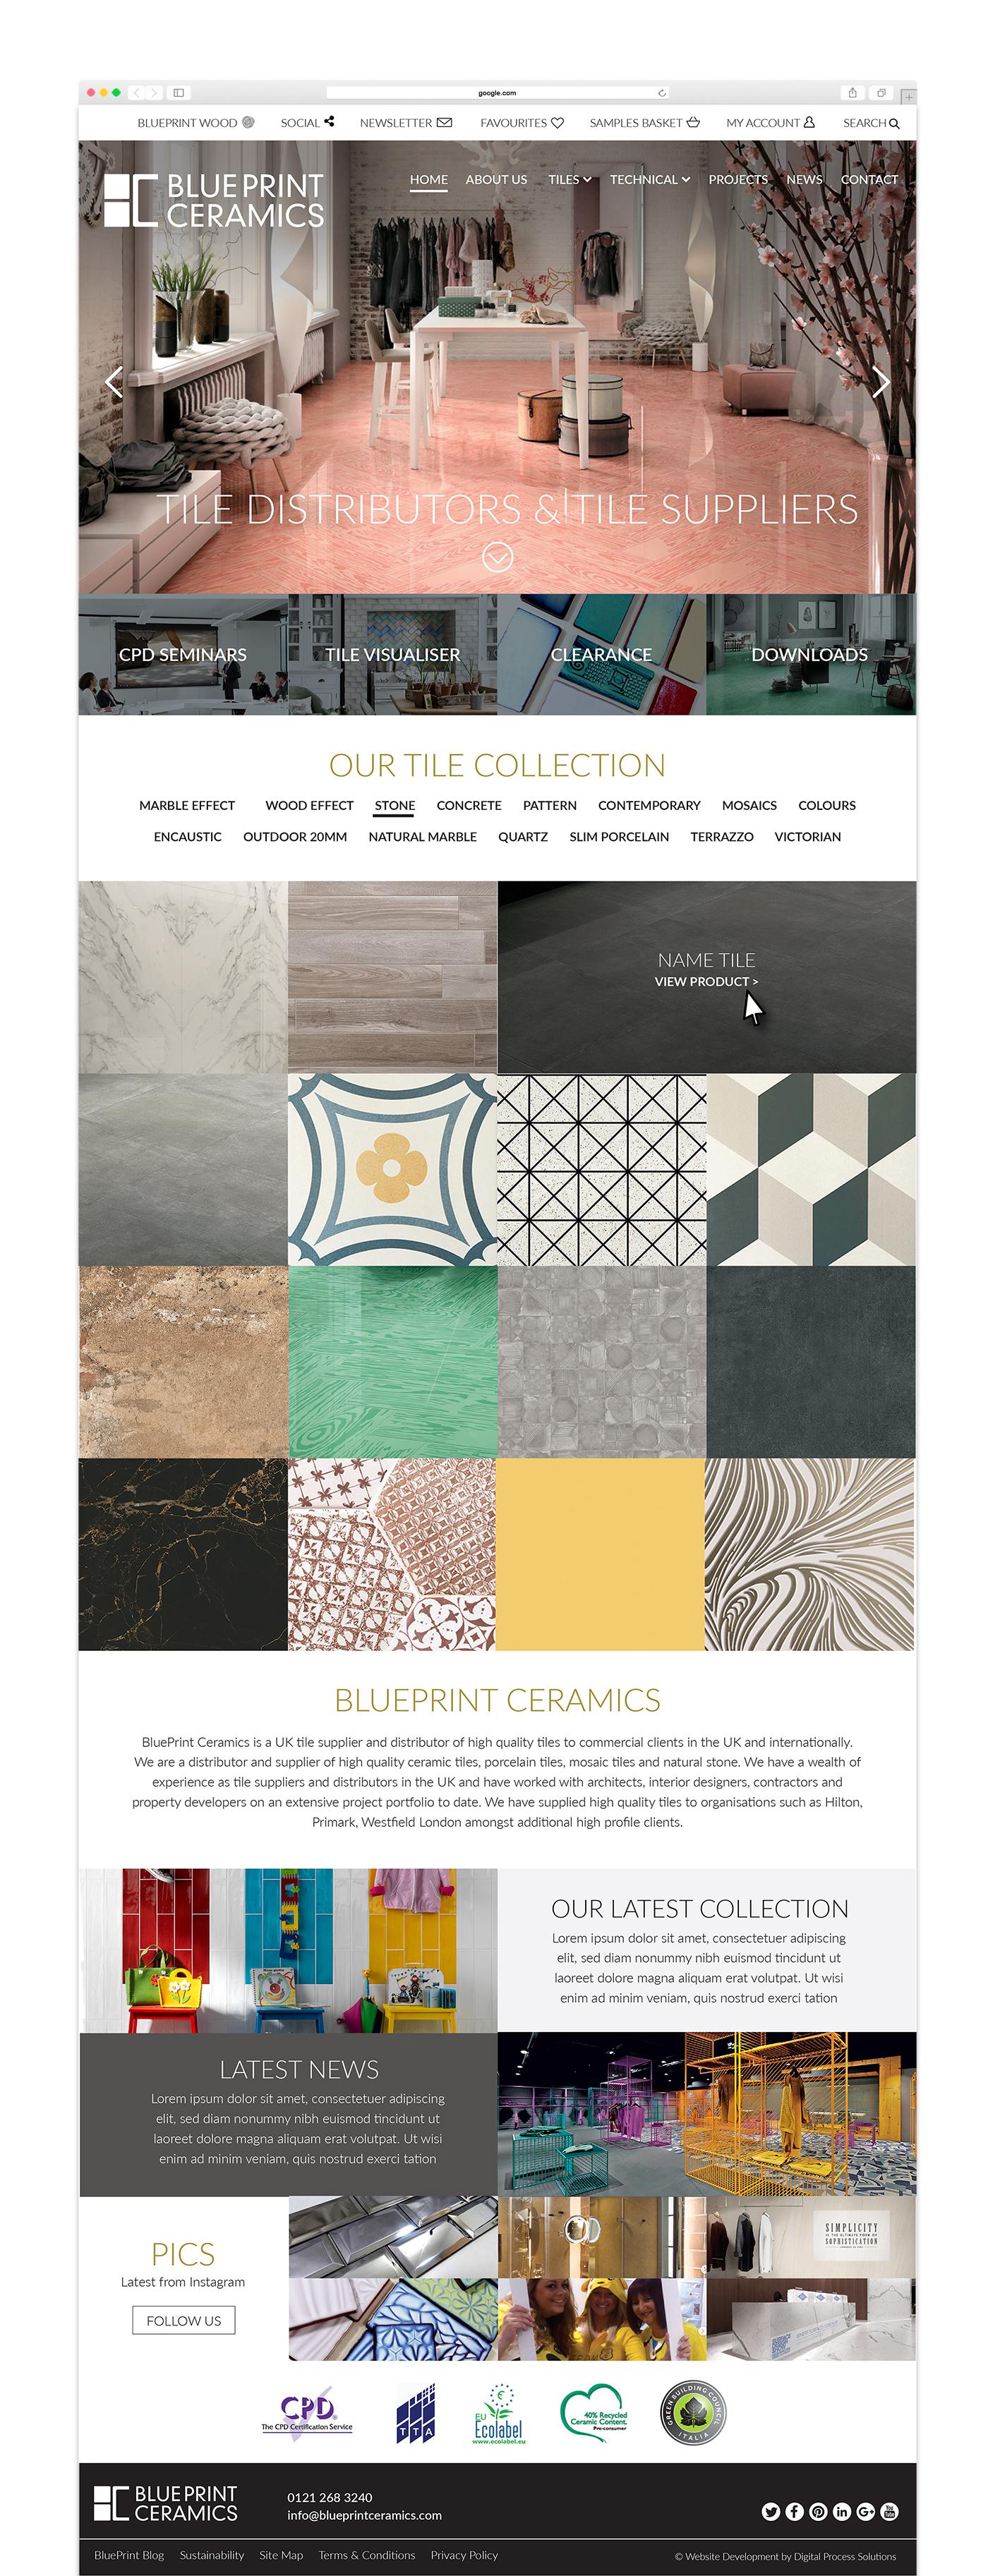 Blueprint ceramics home prev next malvernweather Image collections